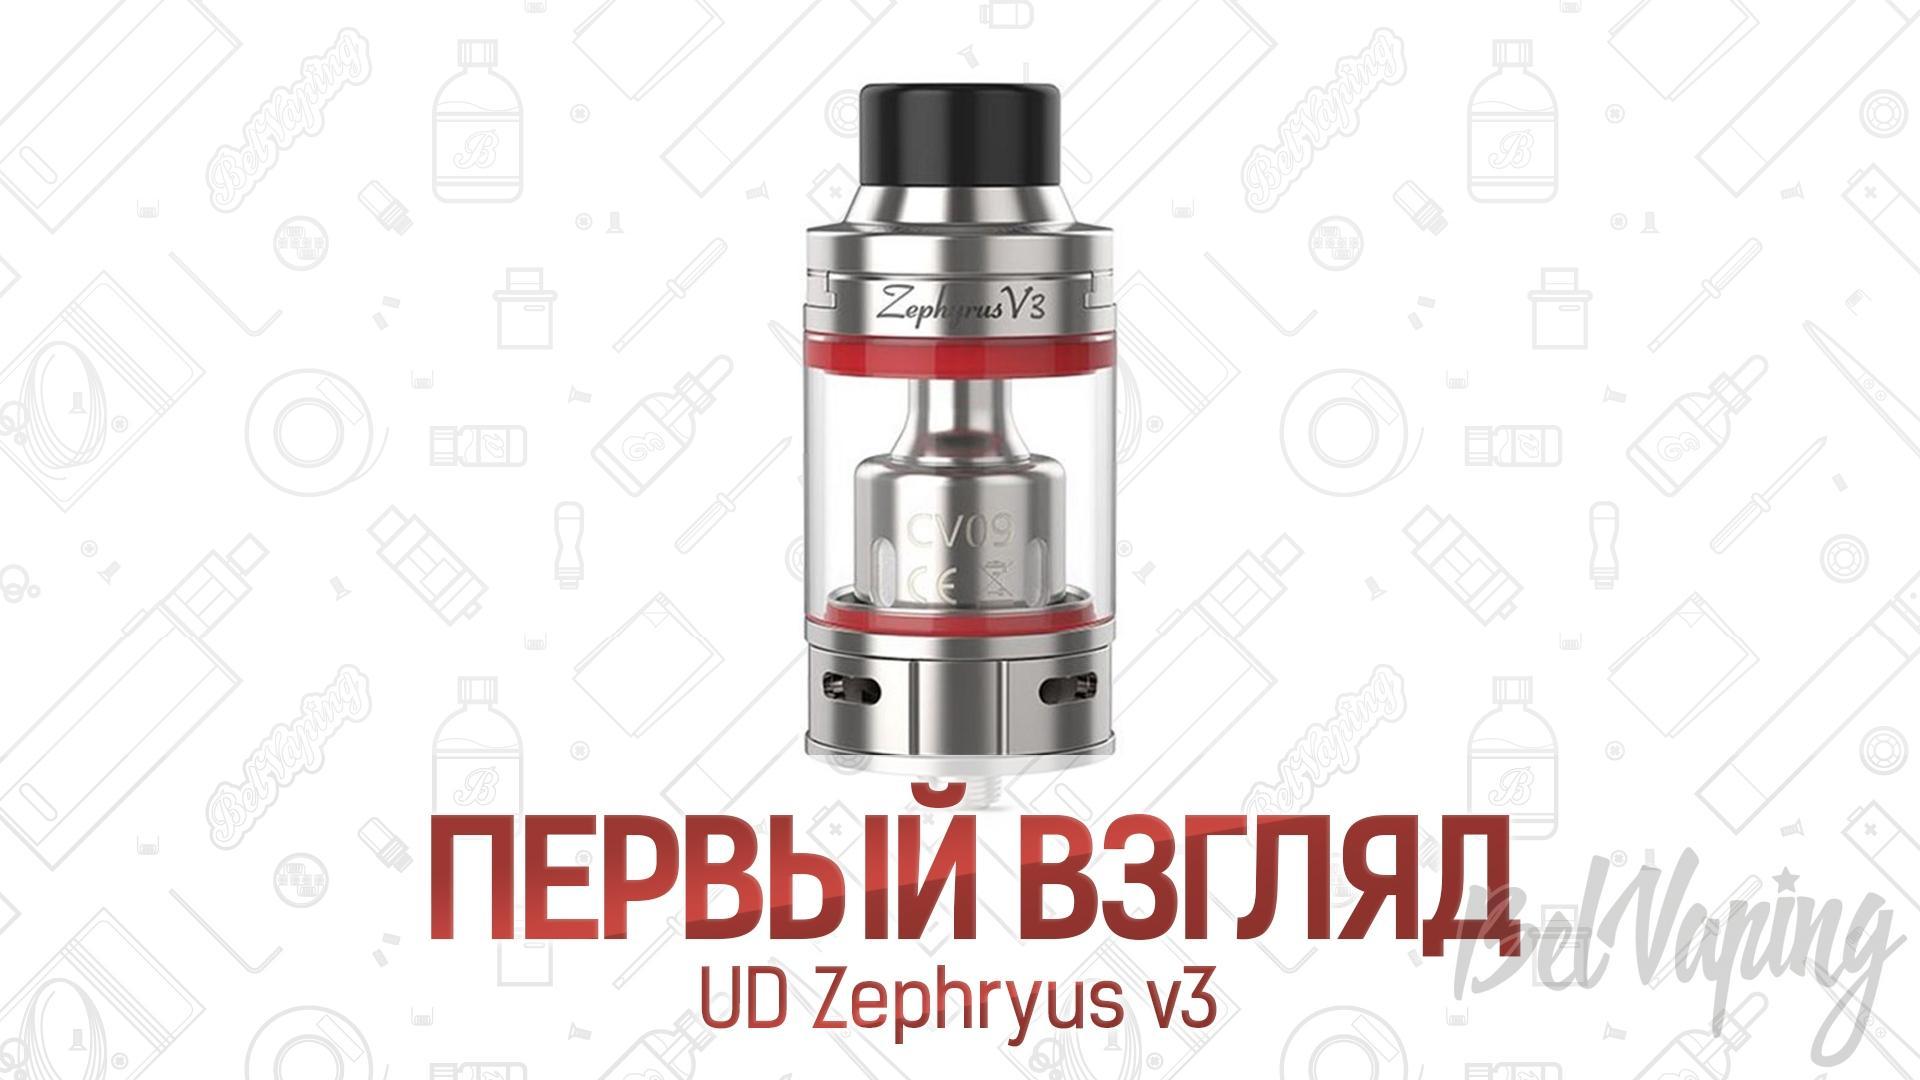 UD Zephryus v3. Первый взгляд